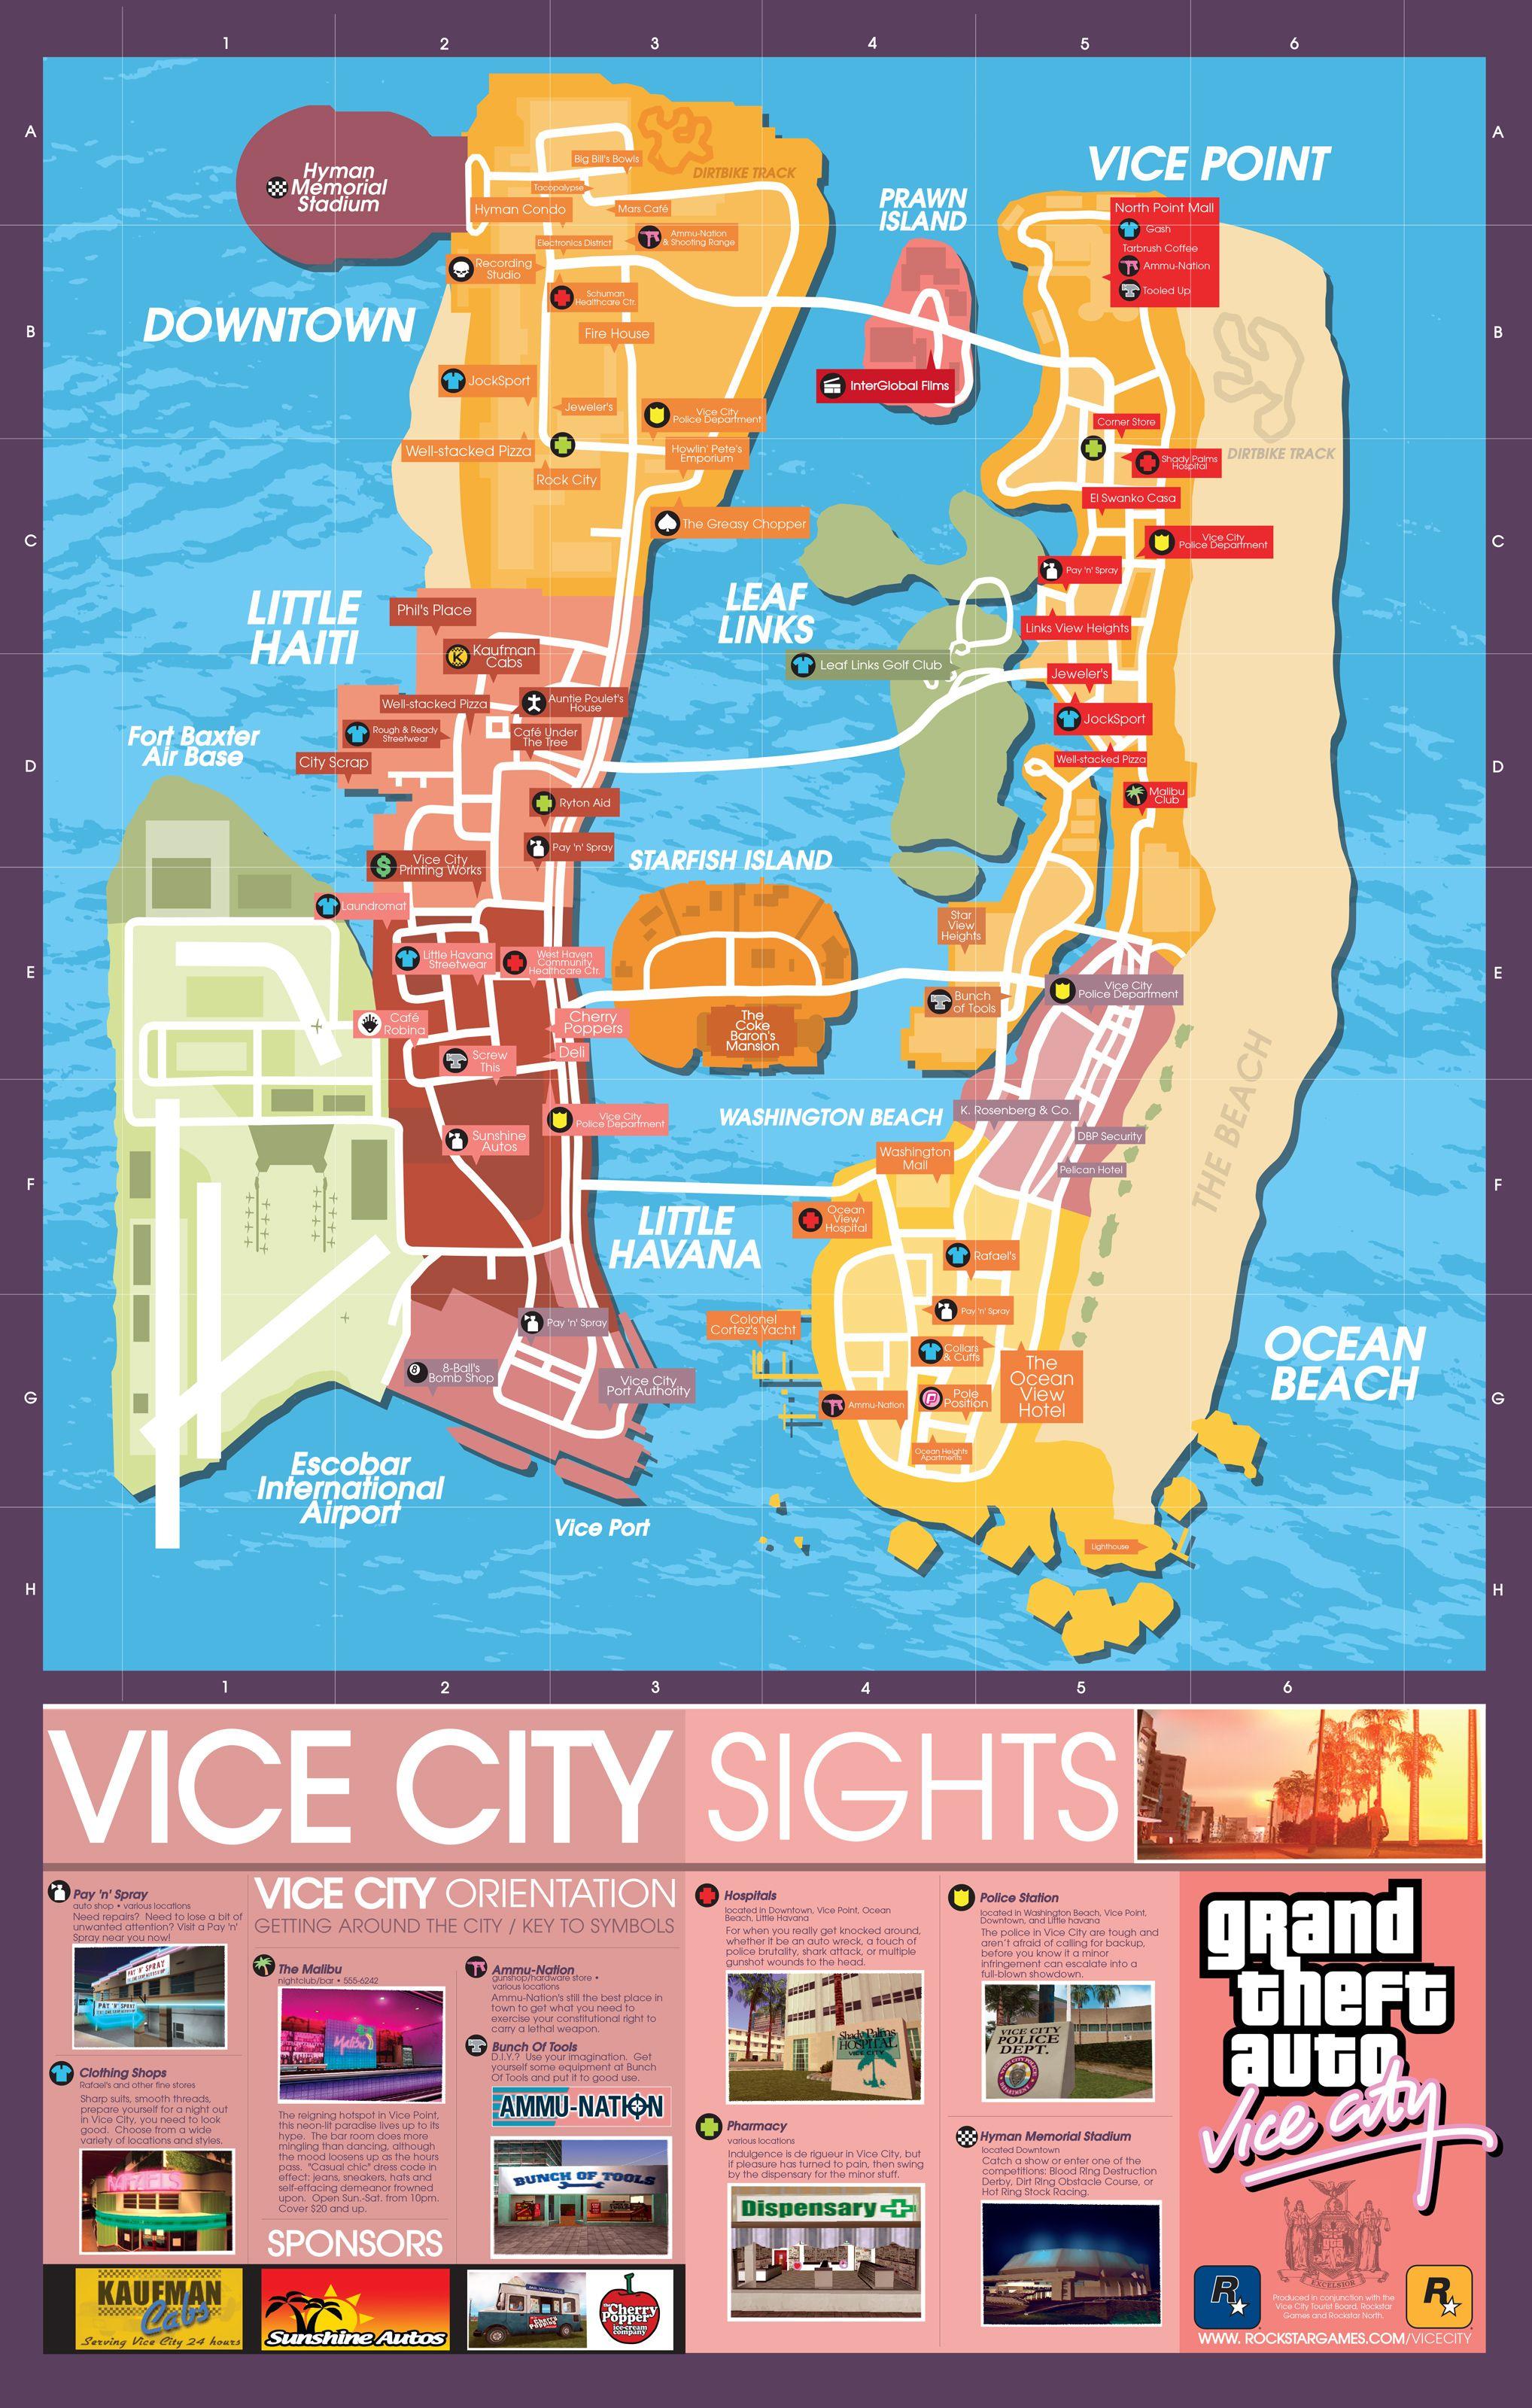 Gta Vice City Map Grand Theft Auto Grand Theft Auto Series Gta